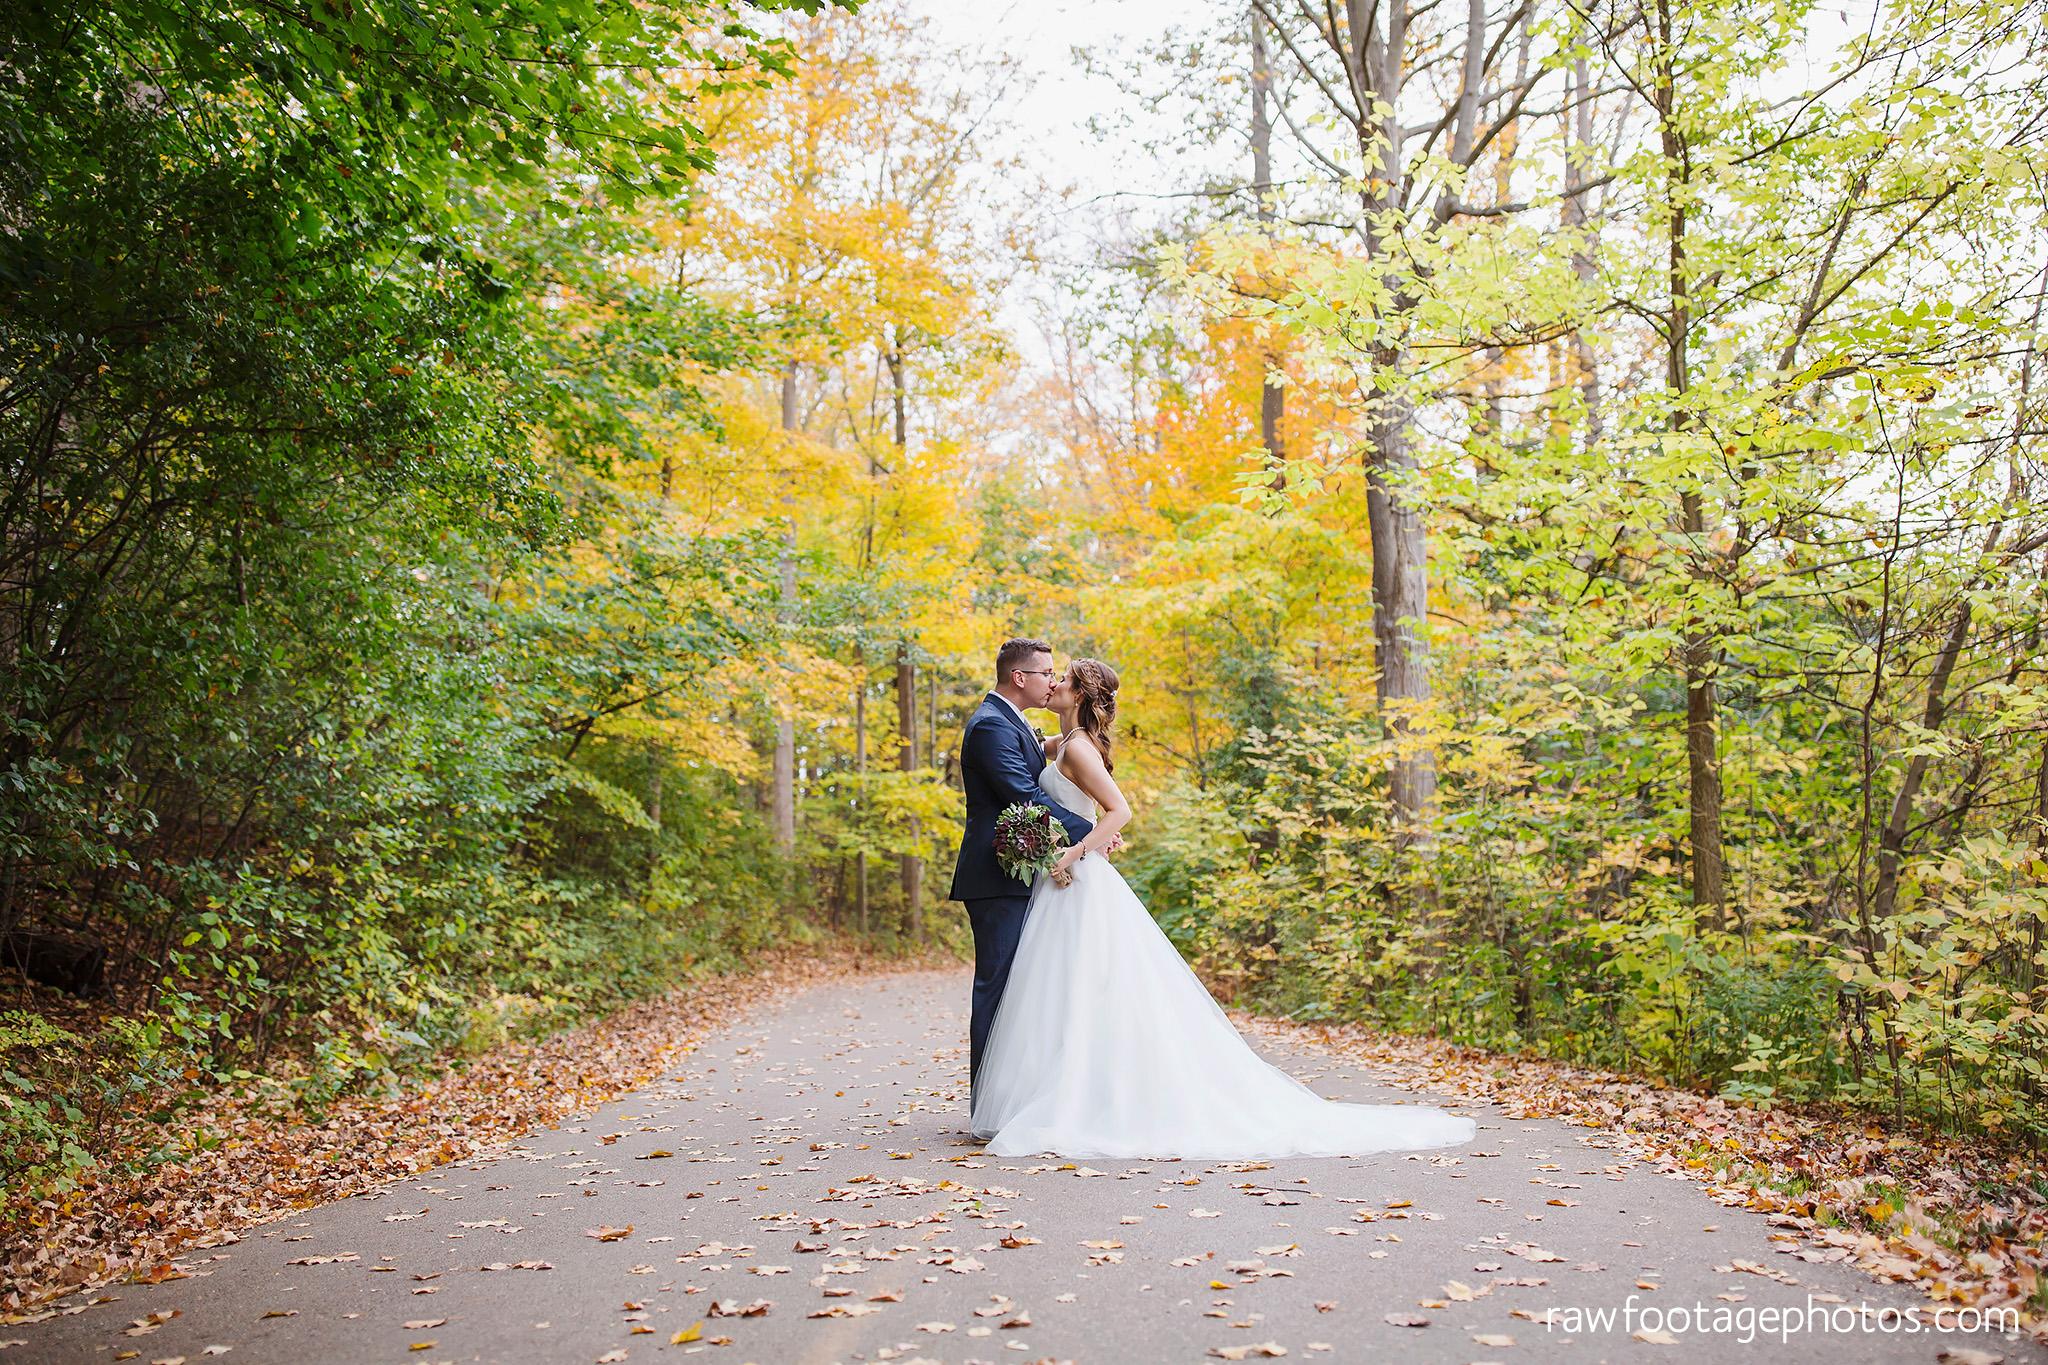 london_ontario_wedding_photographer-civic_gardens-springbank_park-succulent_bouquet-fall_wedding-bridge-raw_footage_photography062.jpg